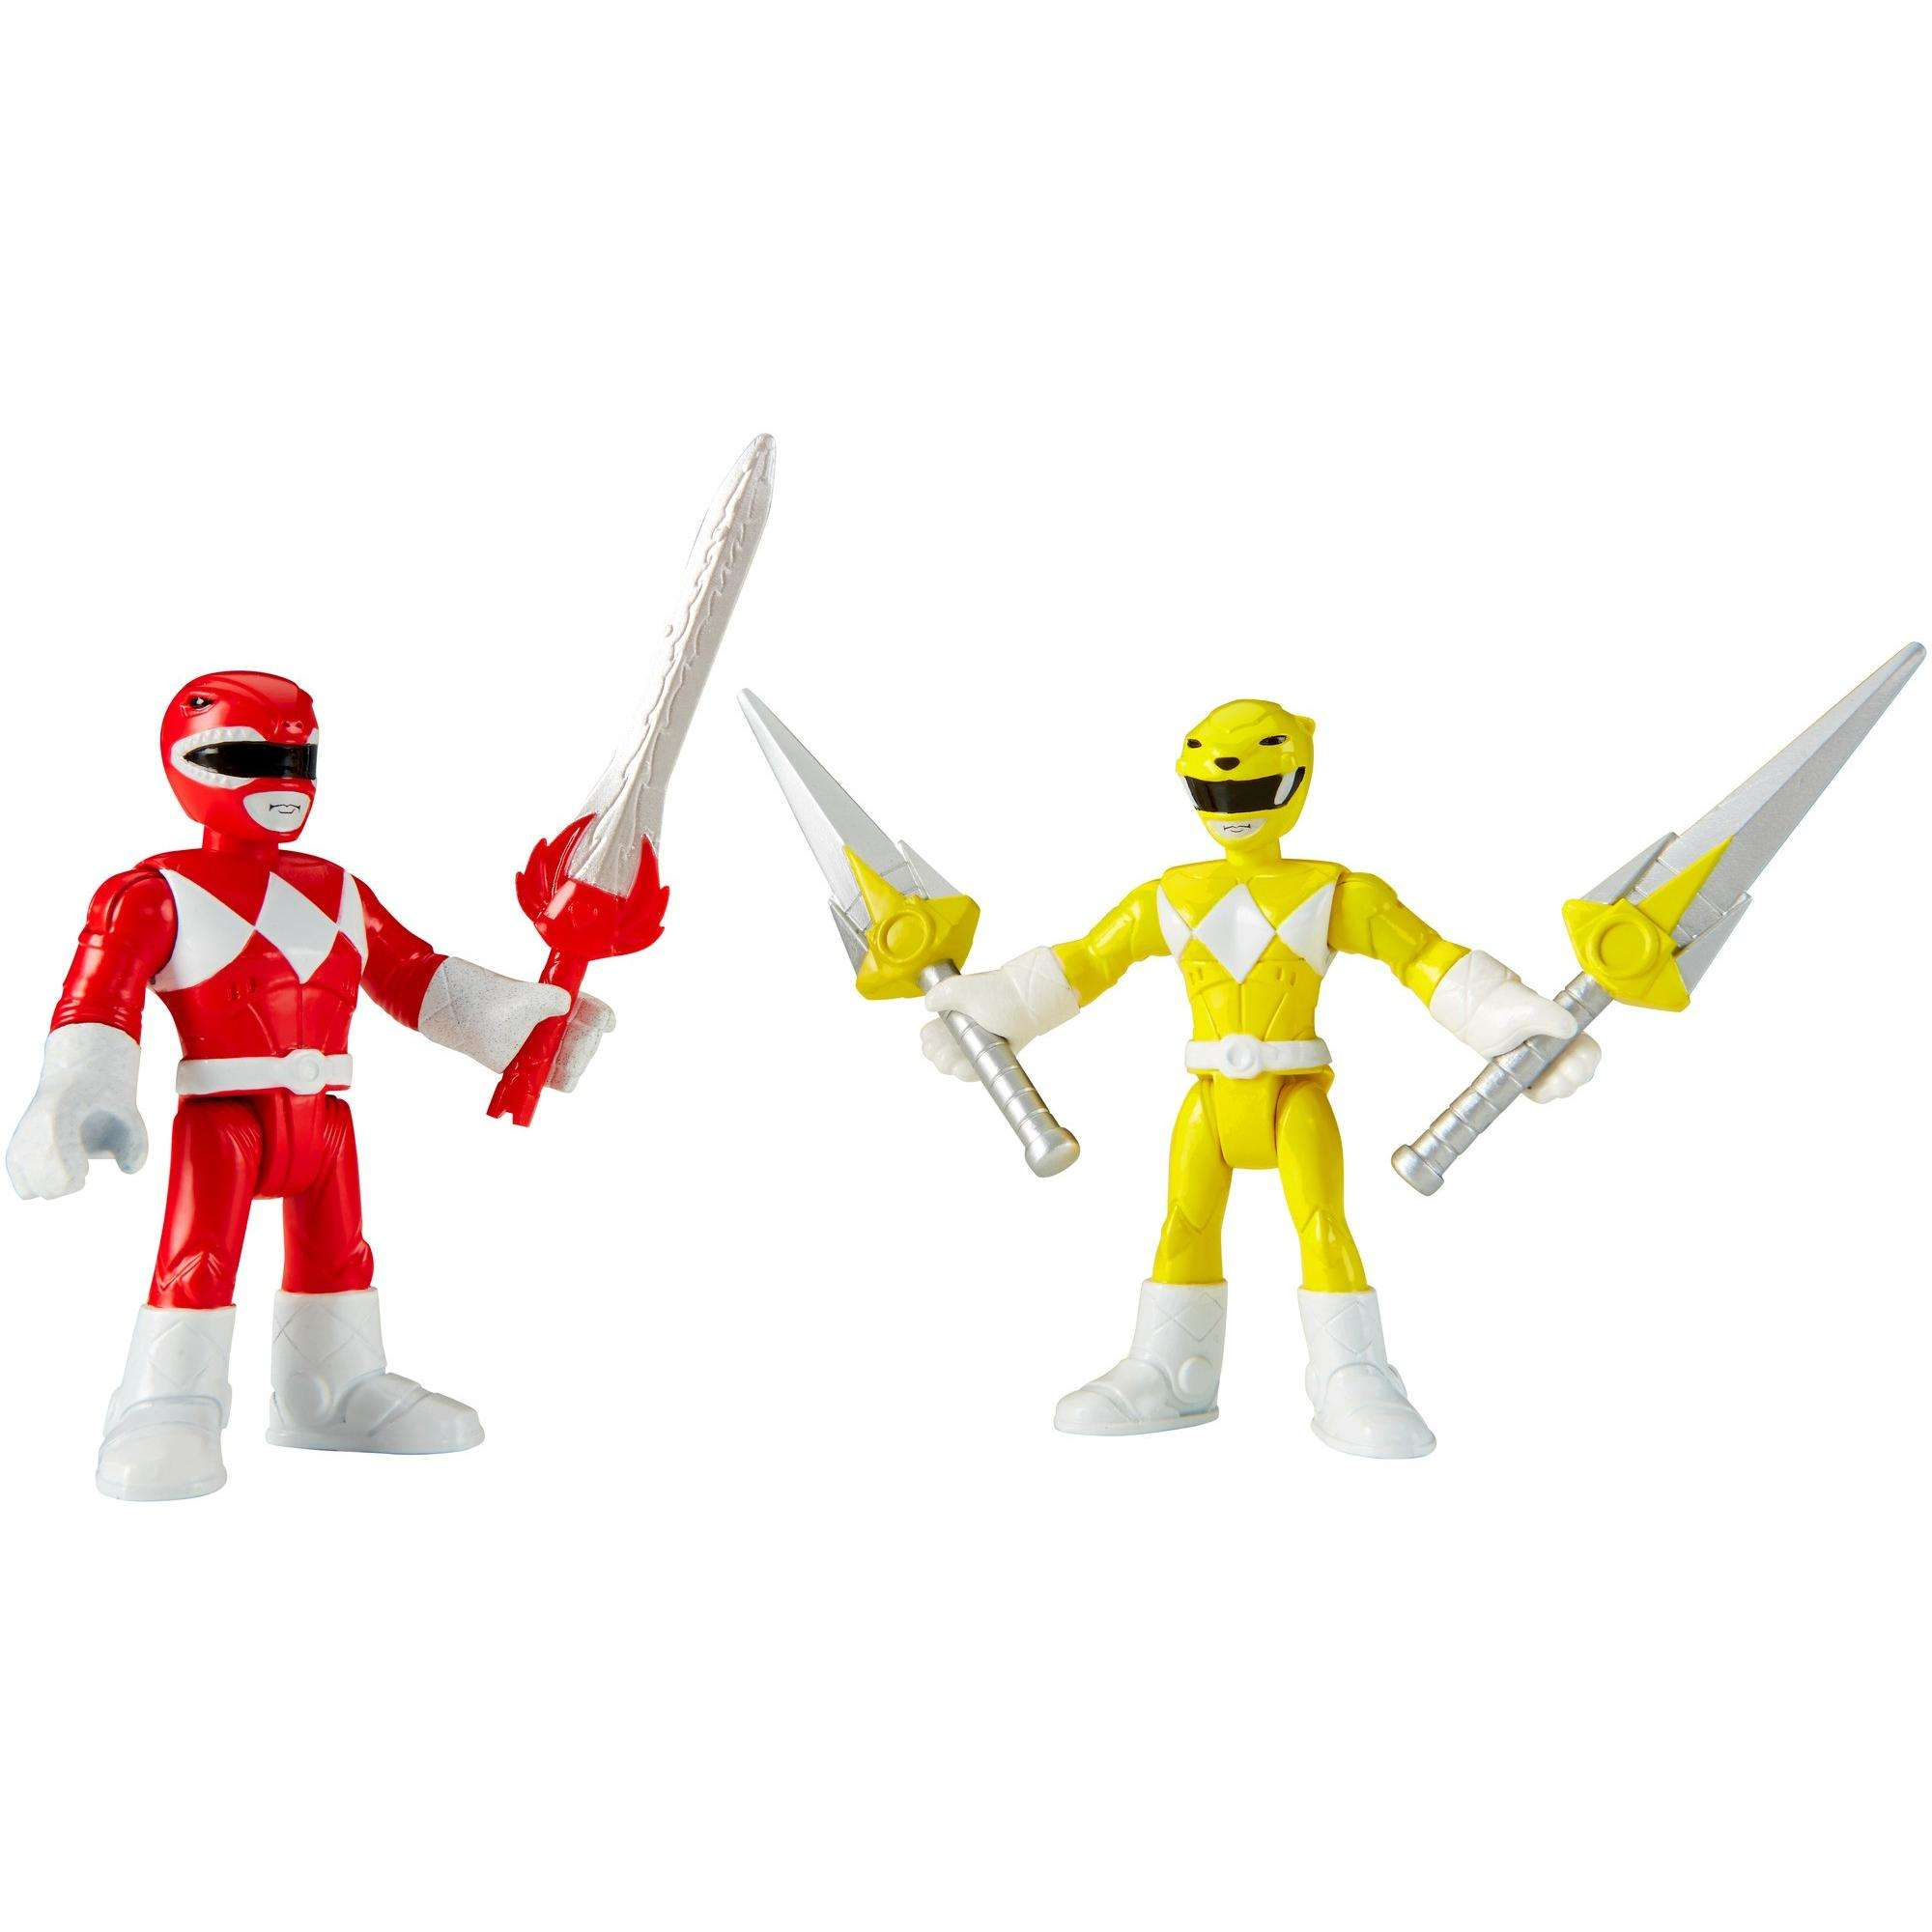 IMaginext Power Rangers Red Ranger & Yellow Ranger by FISHER PRICE